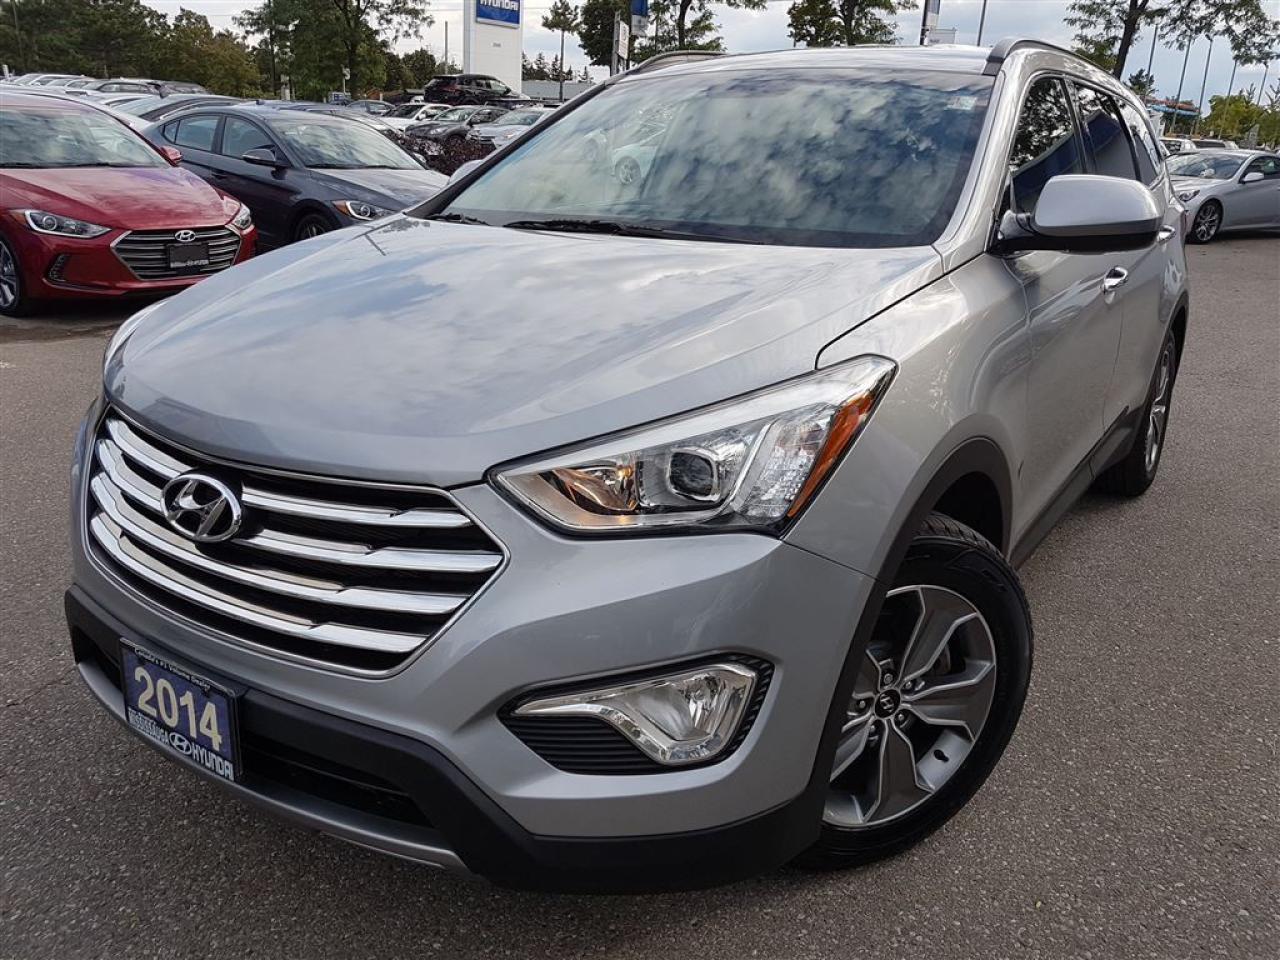 2014 Hyundai Santa Fe XL FWD-one owner-super clean-certified